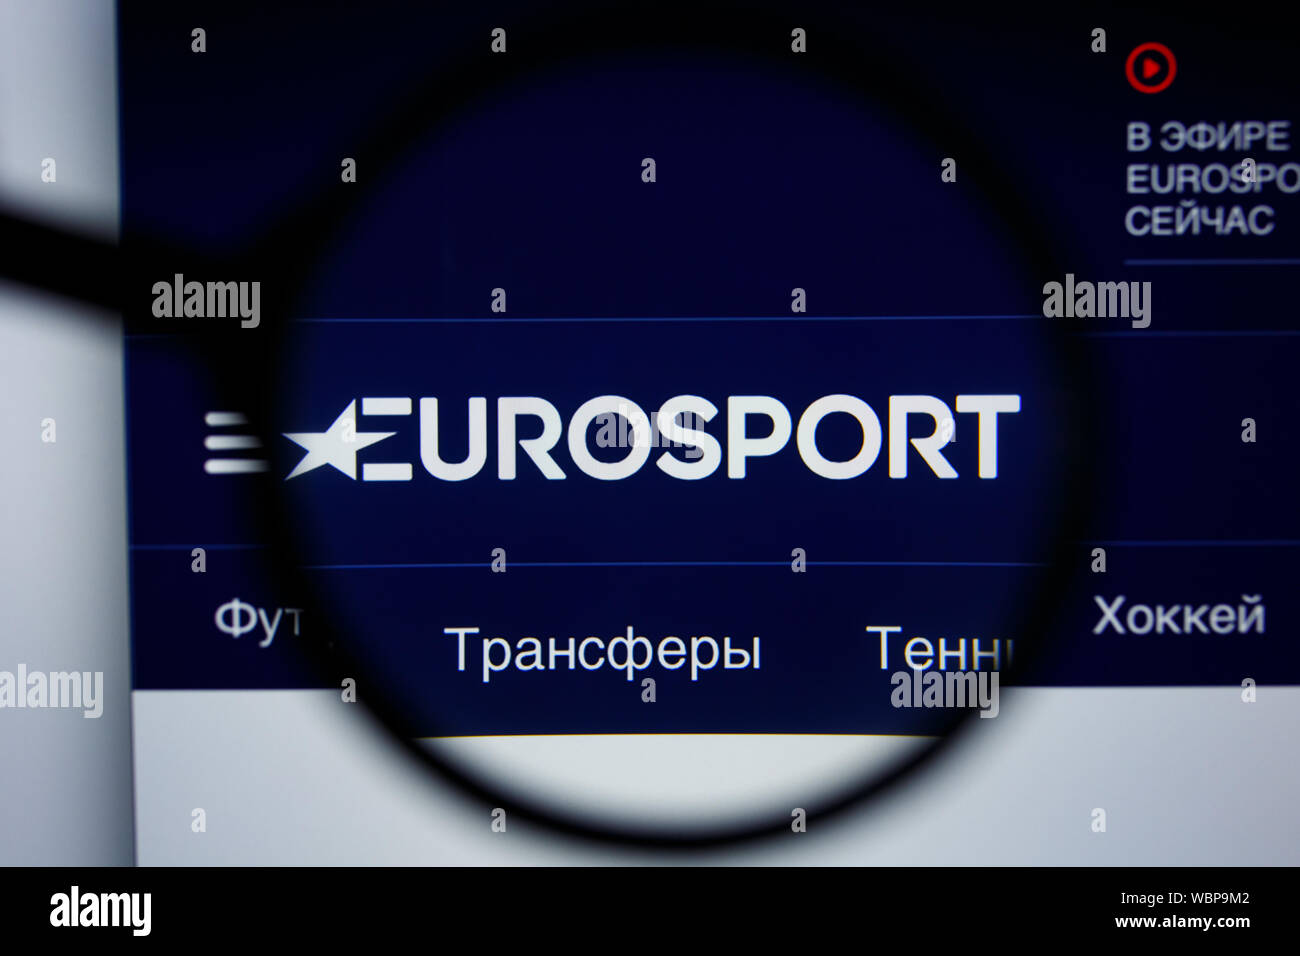 Eurosport ru